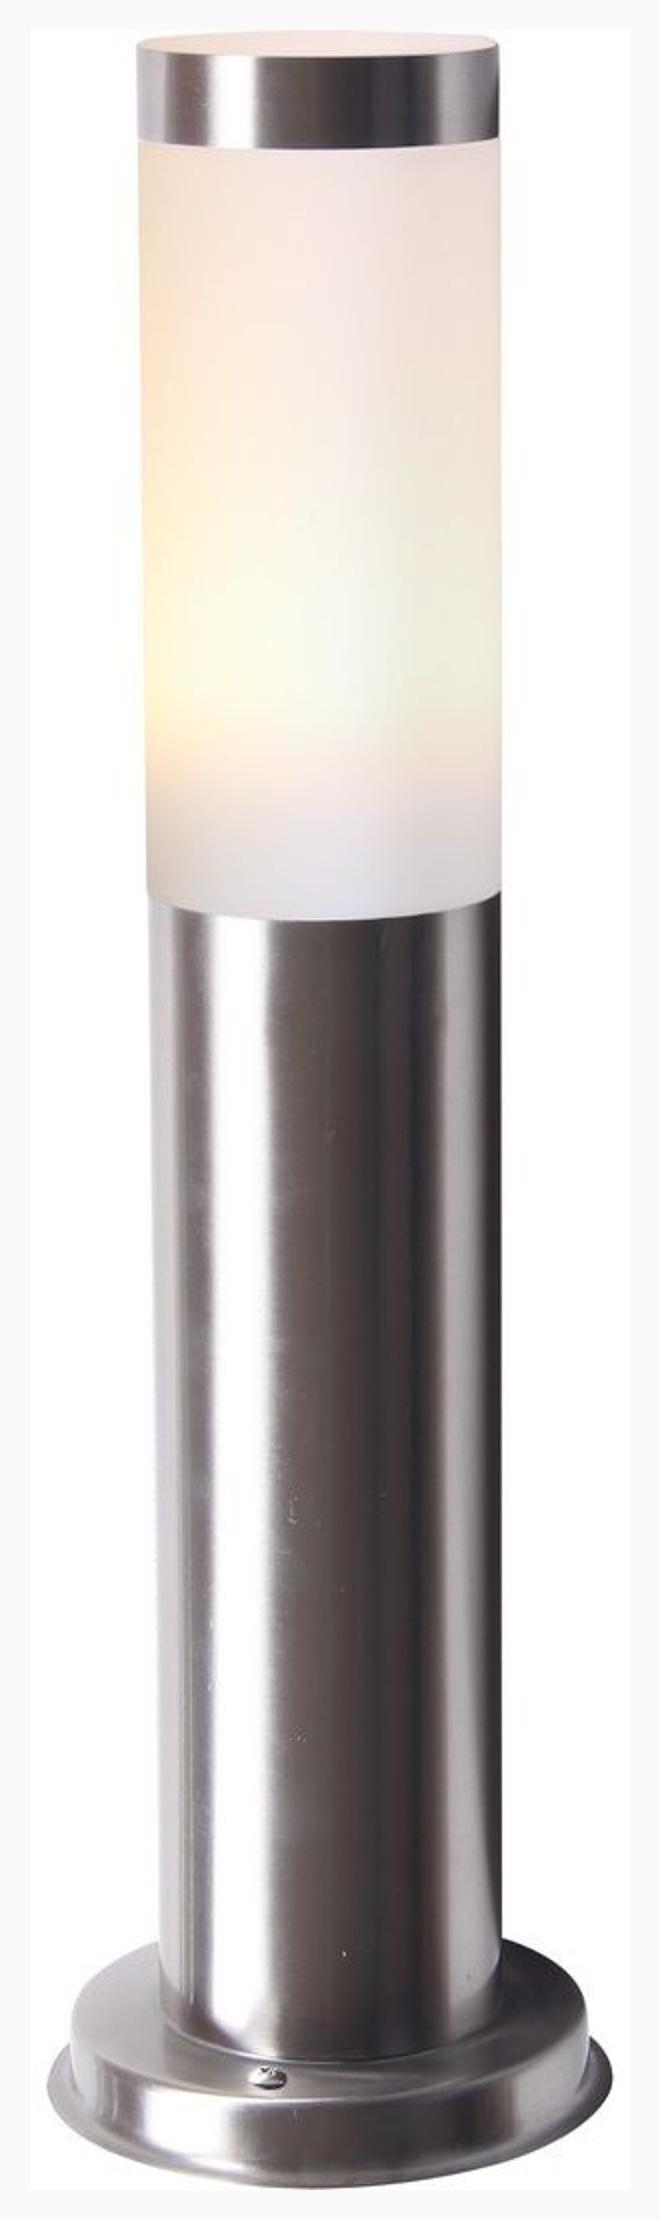 Ландшафтный столбик Arte Lamp A3158PA 1SS